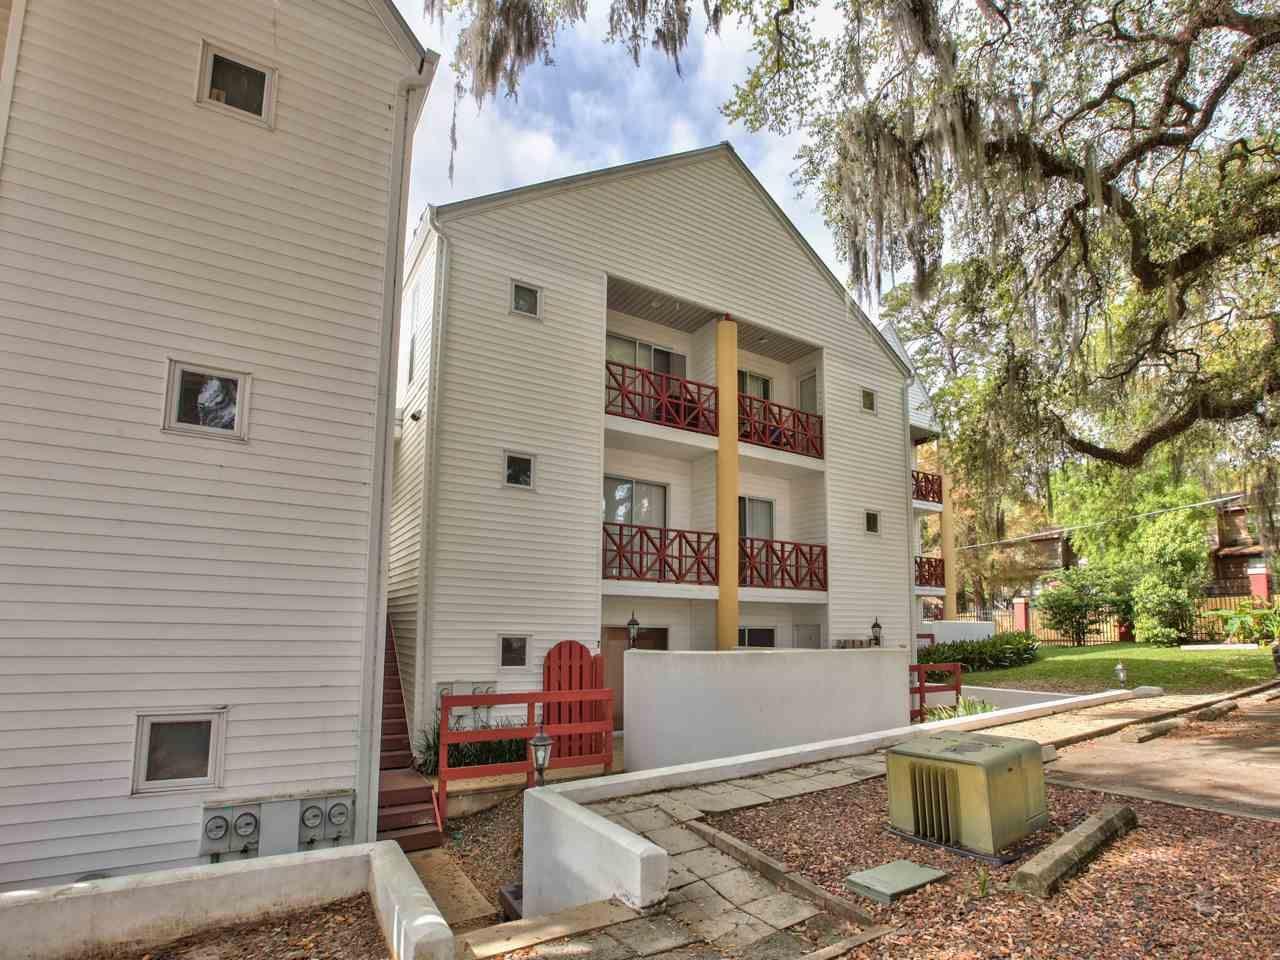 Photo of 317 Hayden Road #4, TALLAHASSEE, FL 32304 (MLS # 330482)